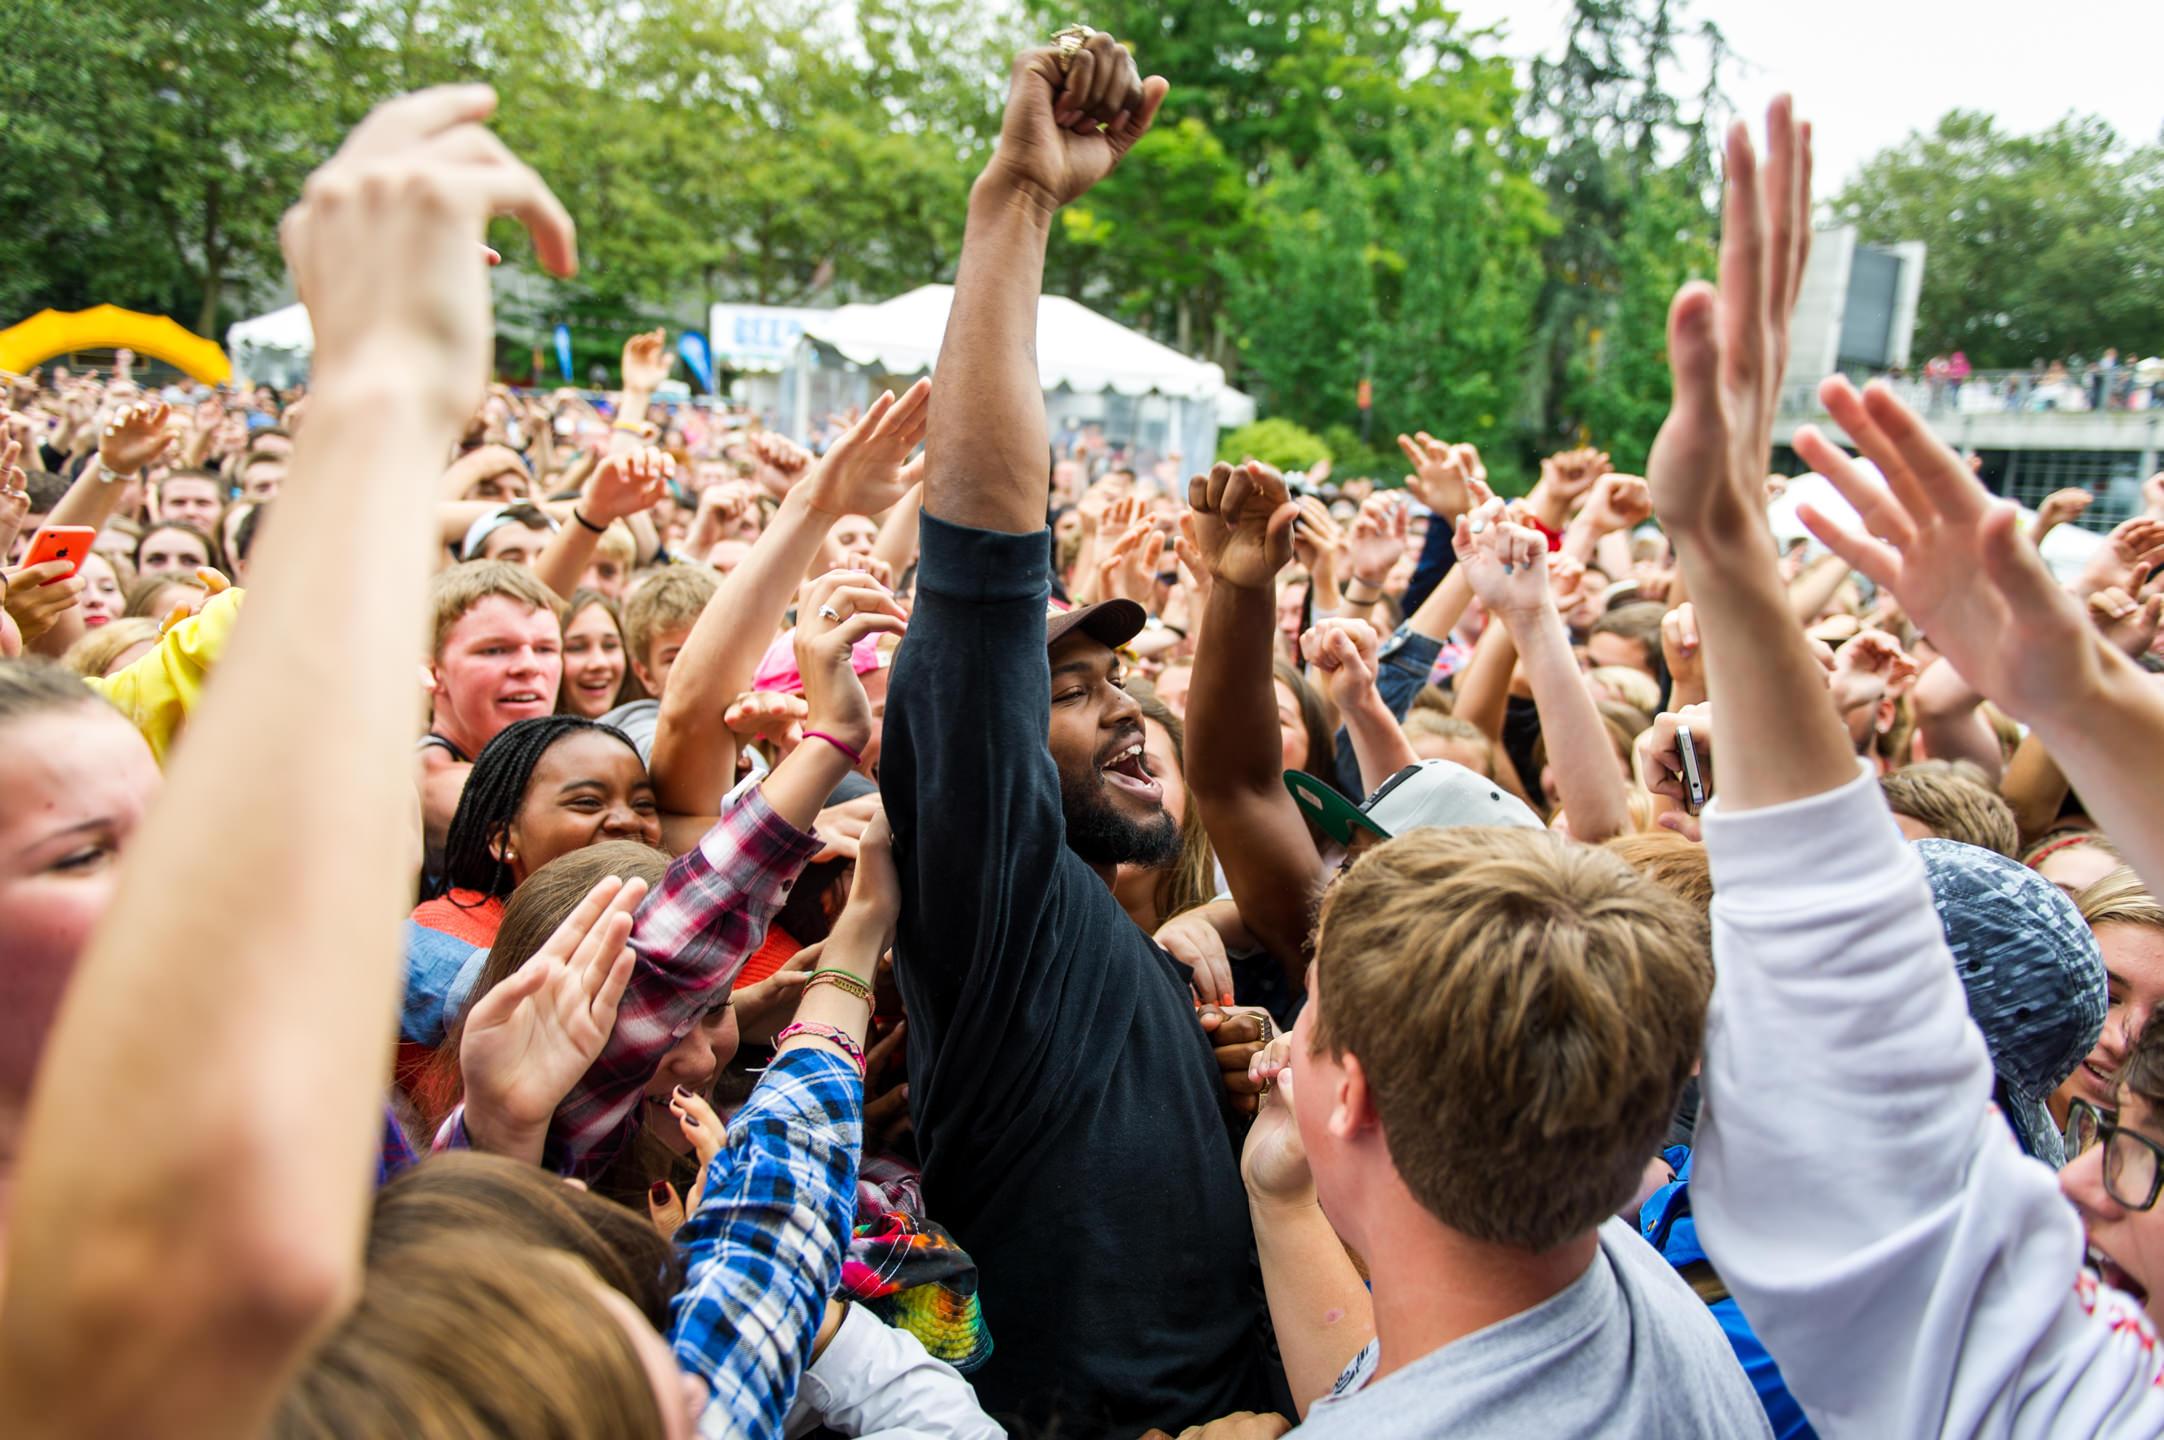 Raz Simone with Sam Lachow at Bumbershoot Music Festival at Seattle Center Washington 2014